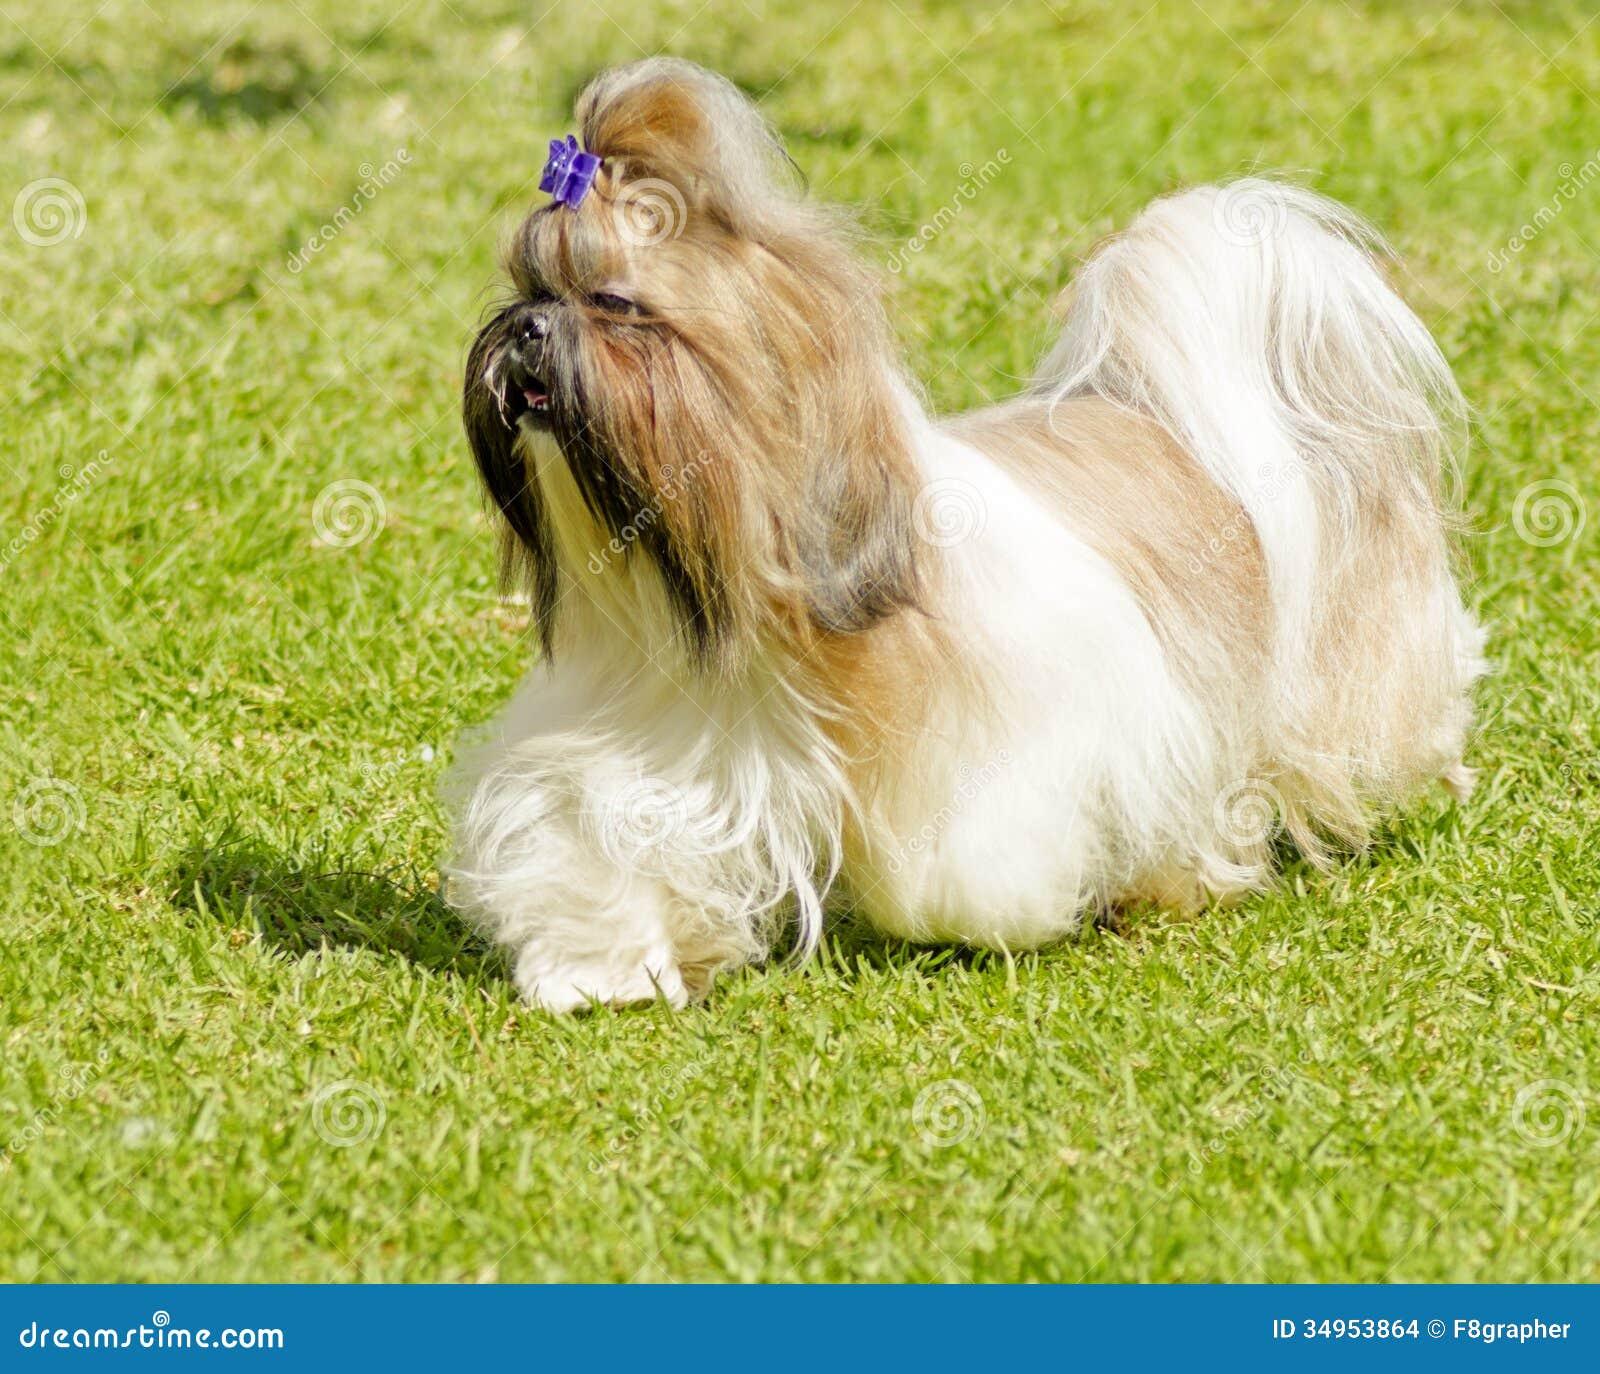 Vector sketch dog shih tzu breed stock vector illustration of.